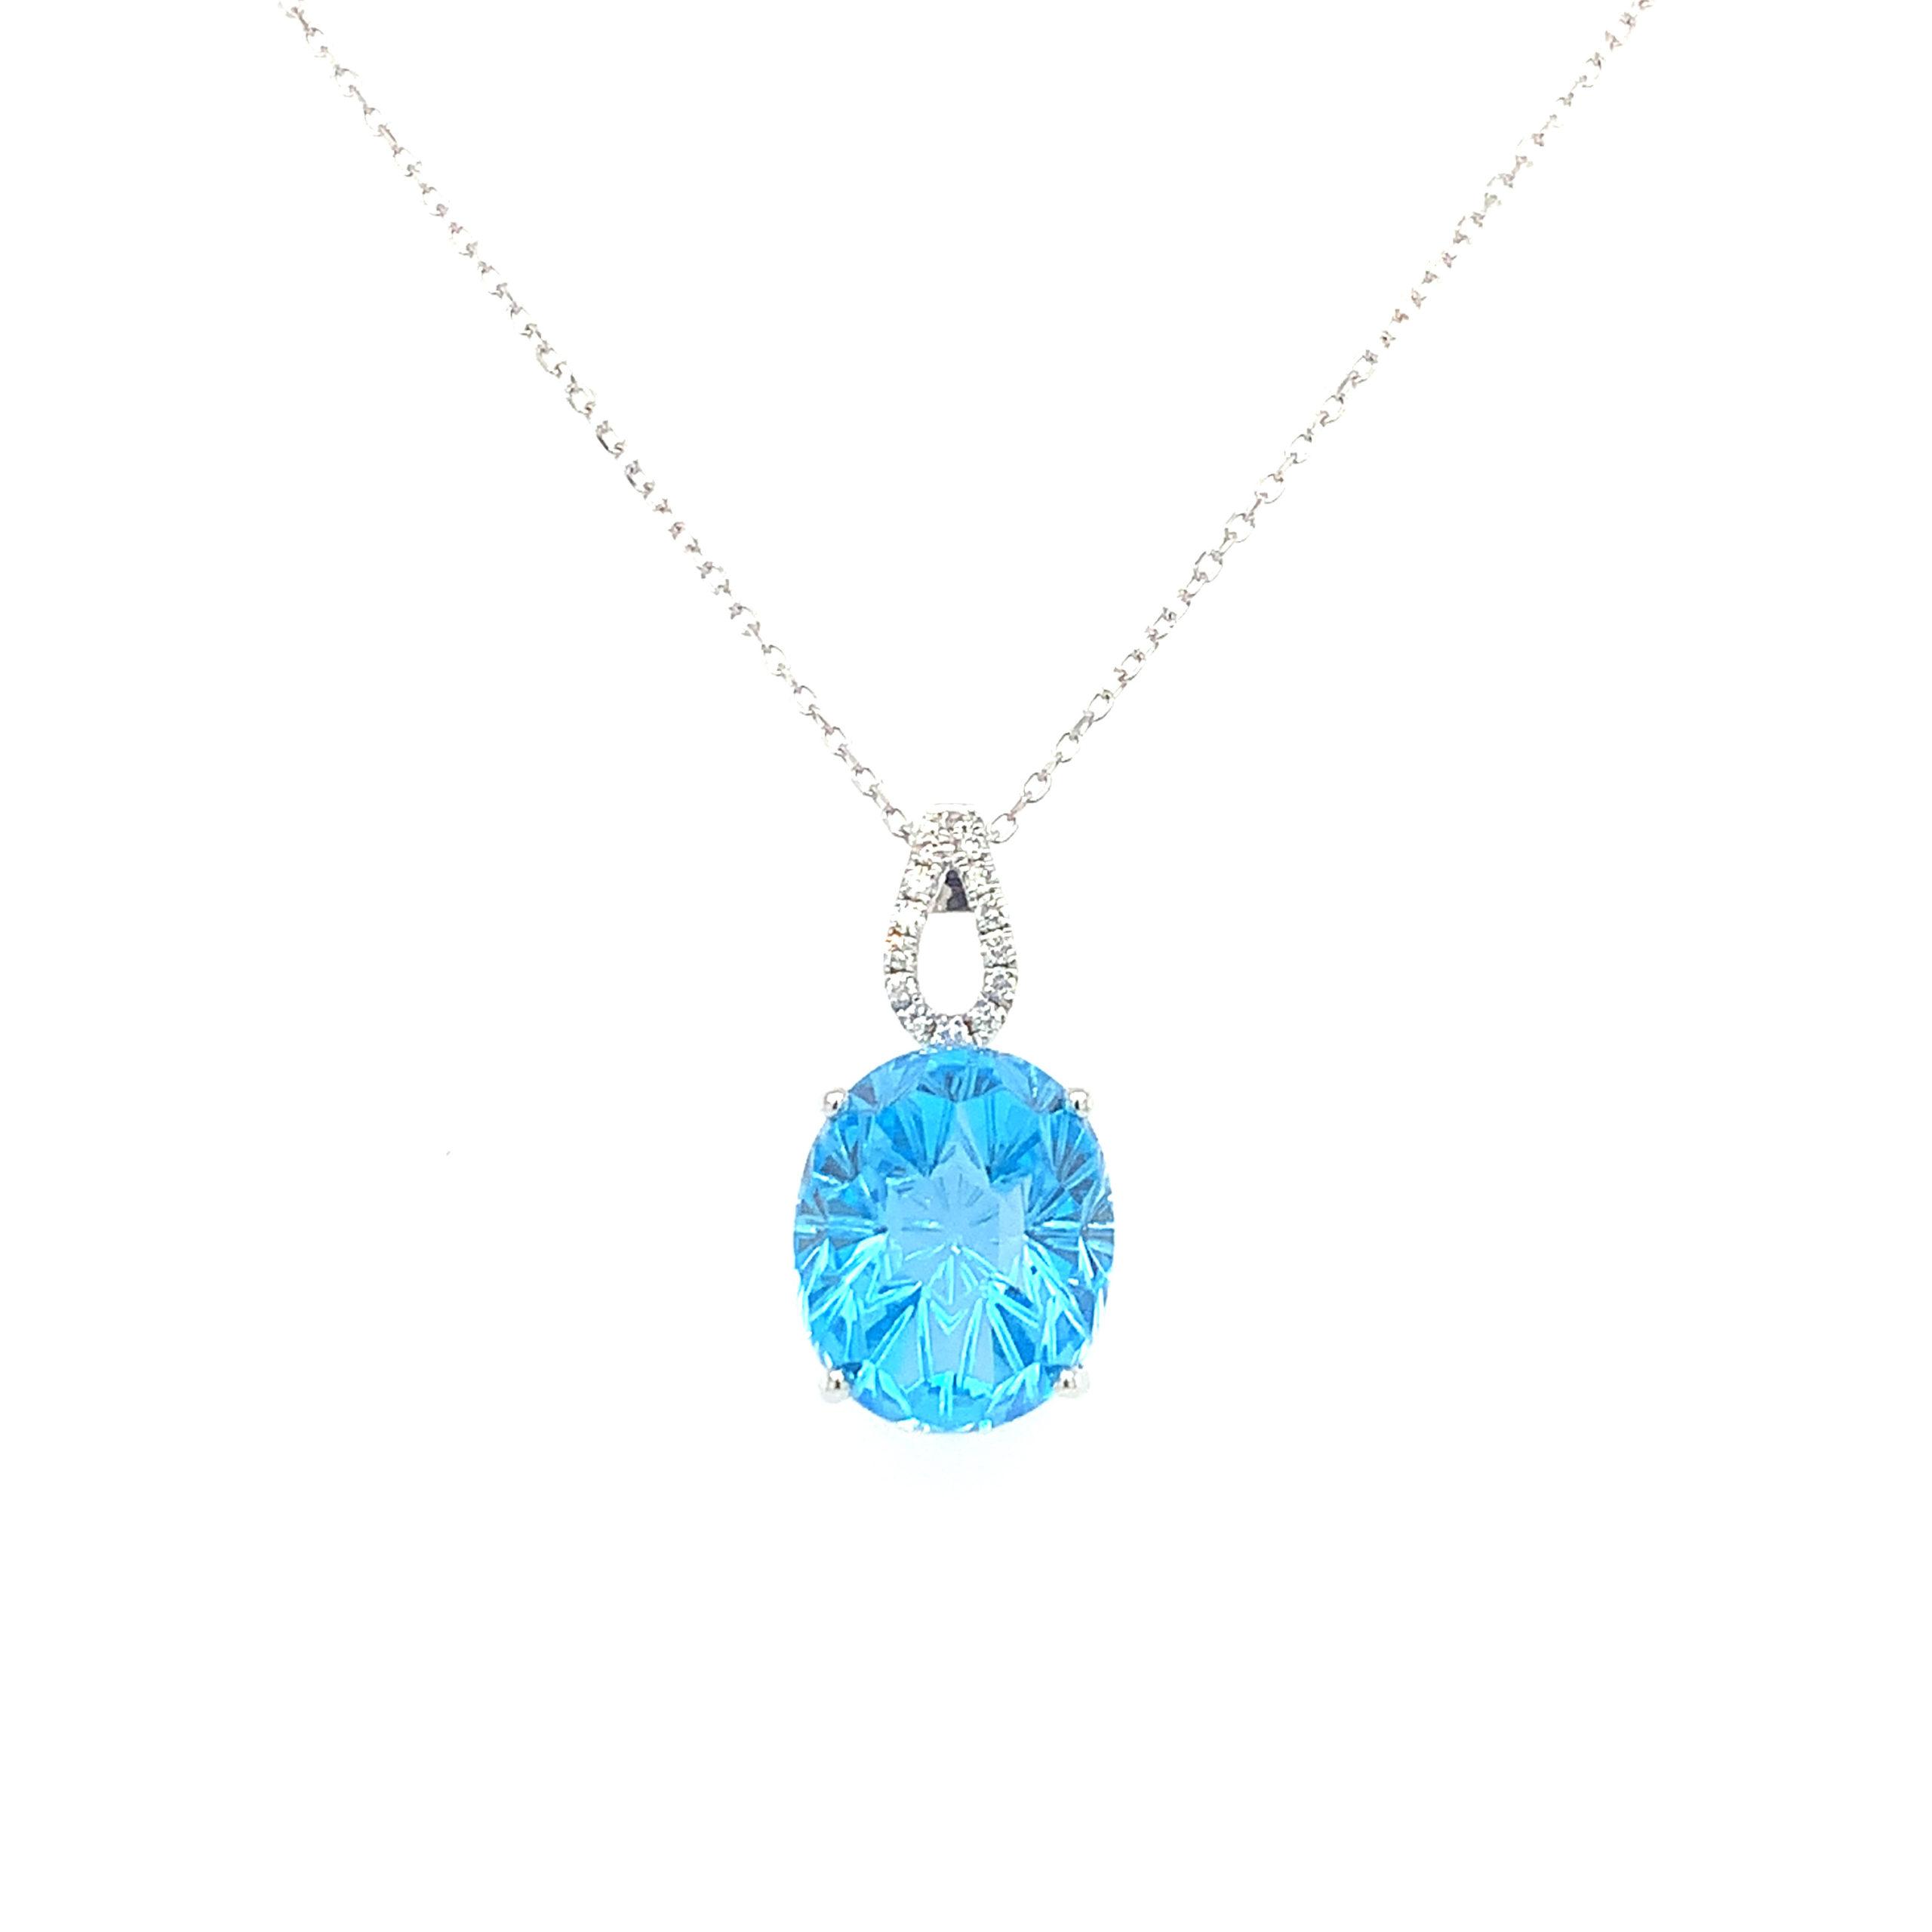 White Gold Blue Topaz Pendant Necklace